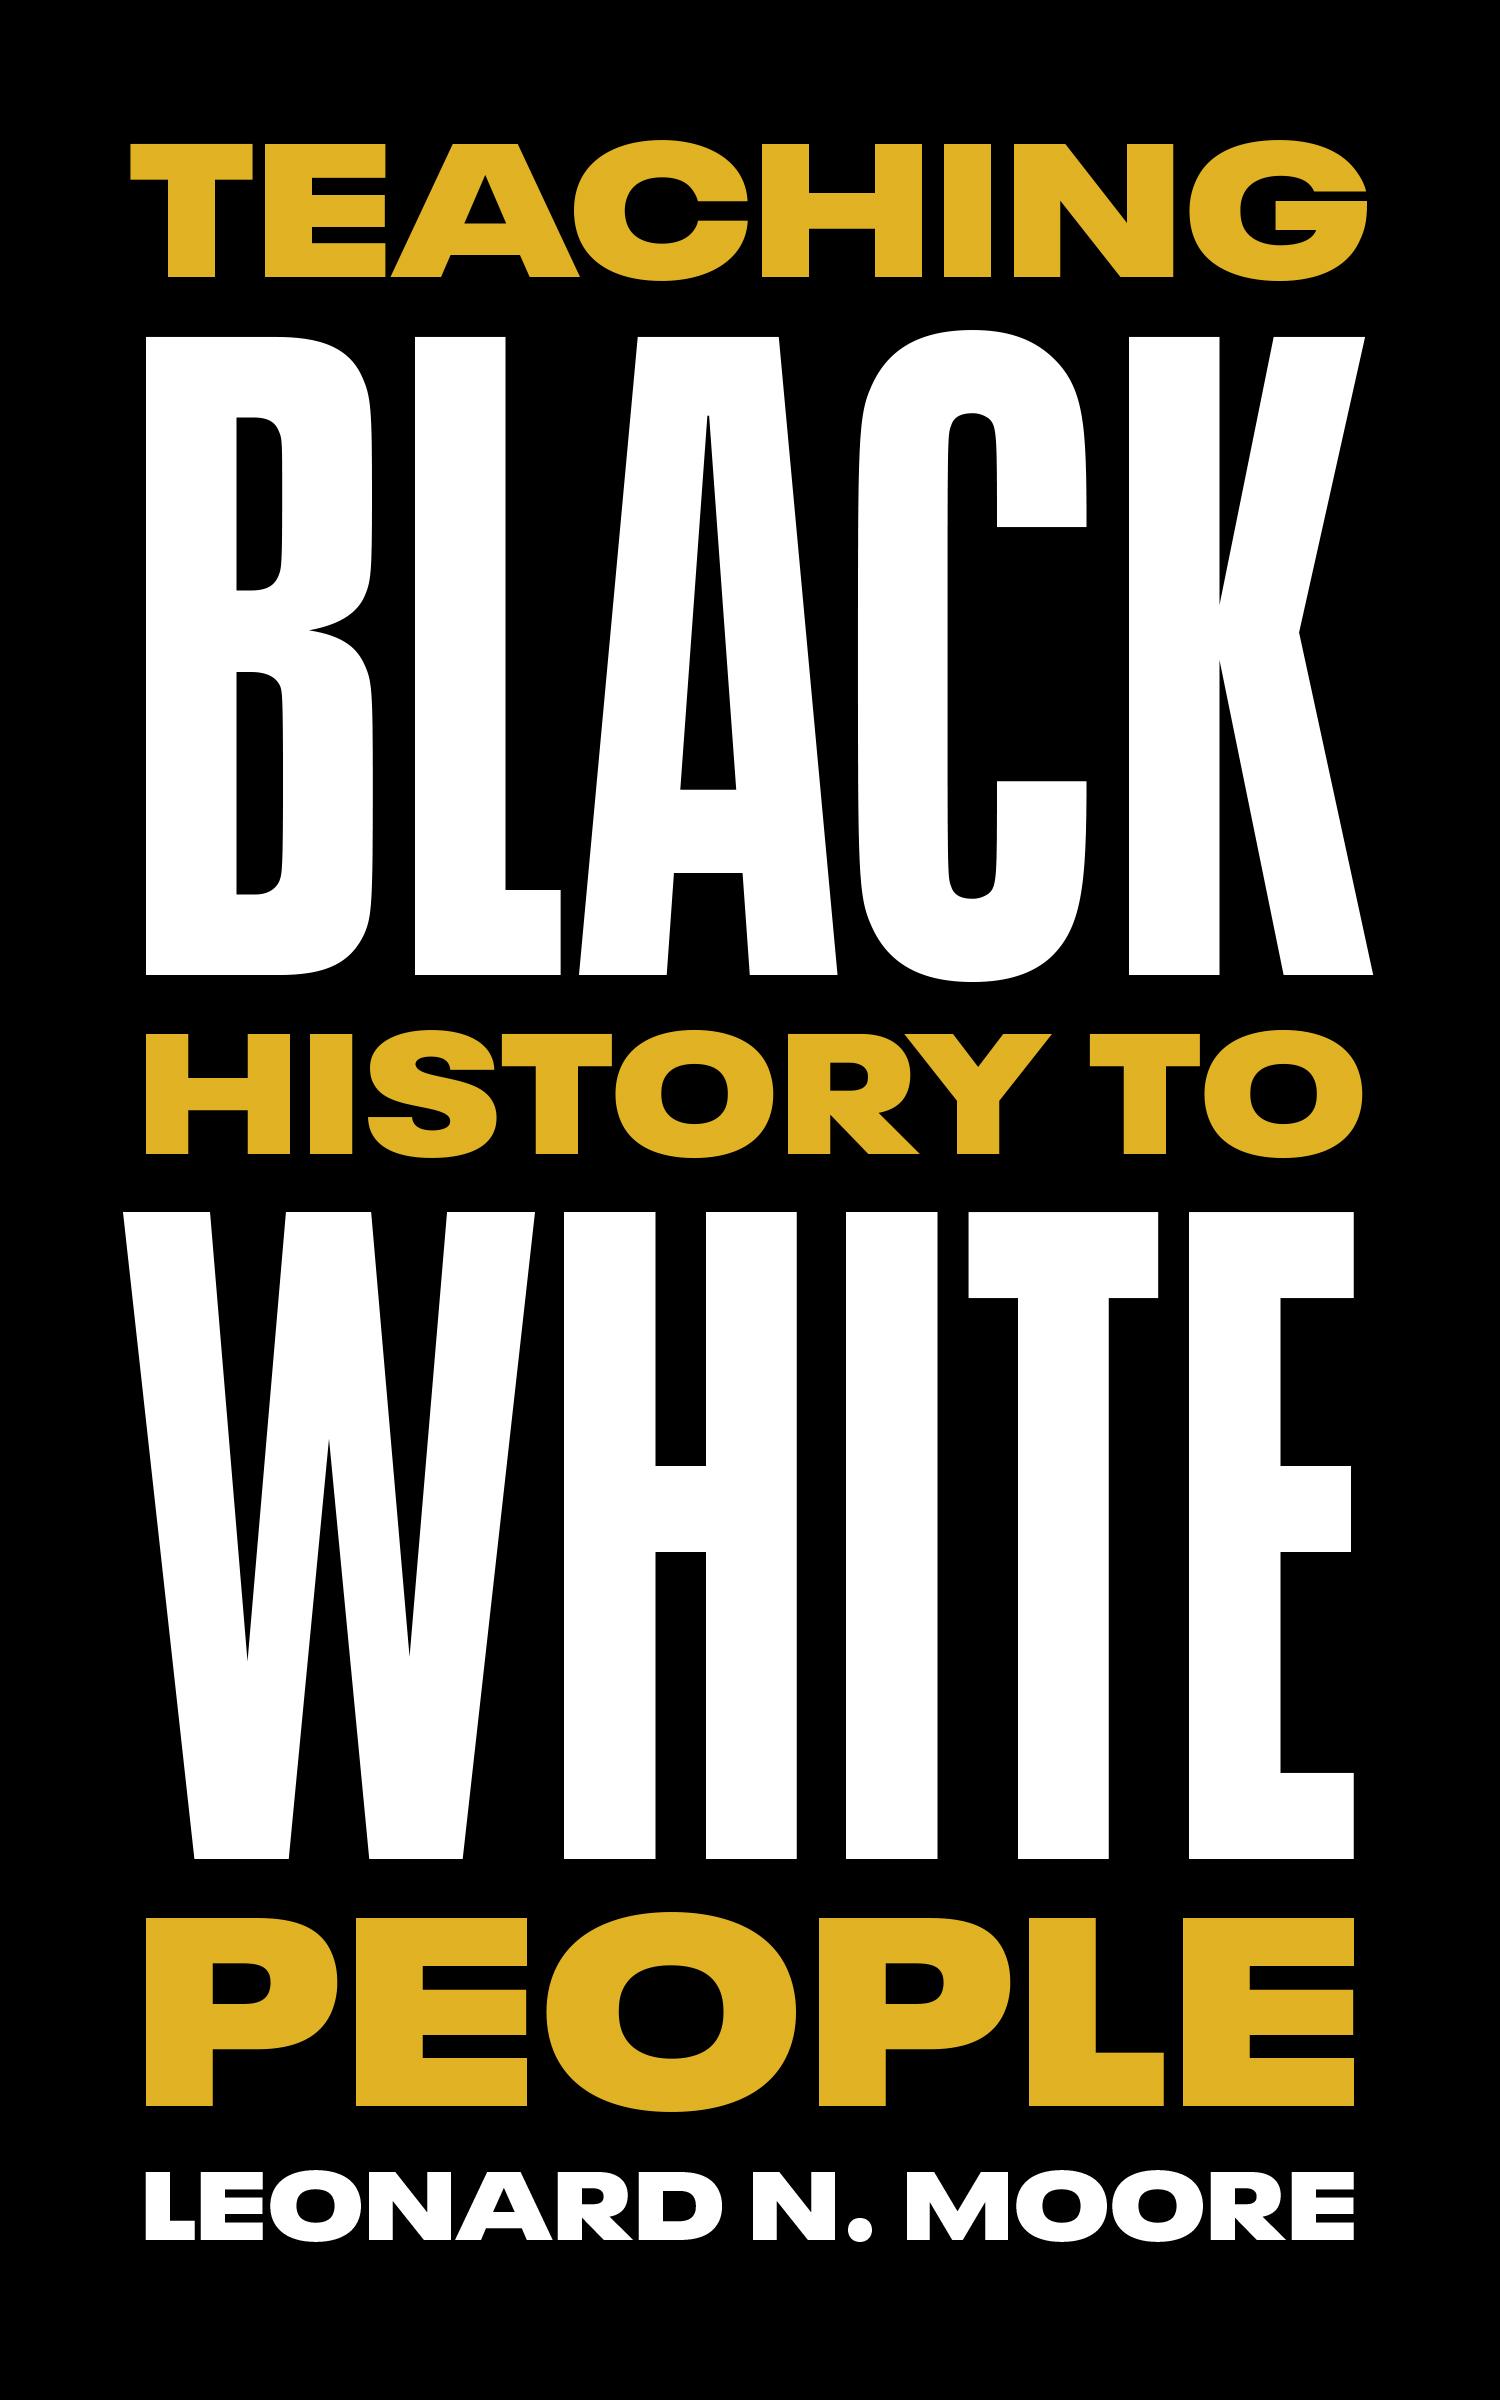 Teaching Black History to White People